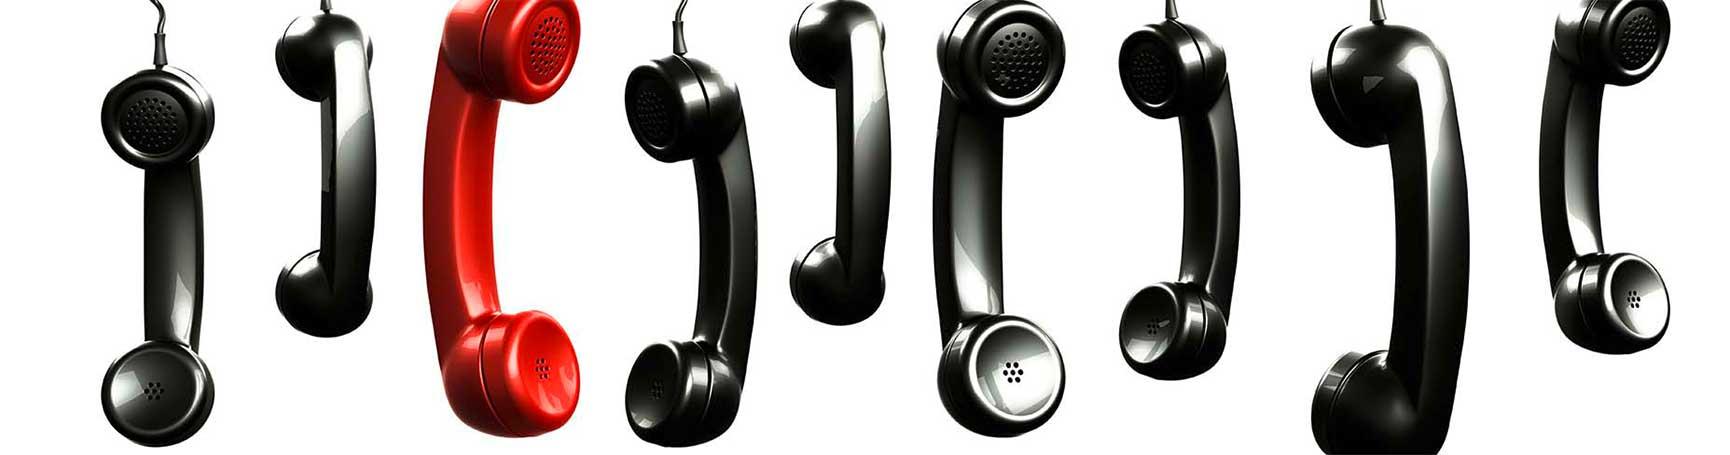 telefoneVonDerDecke